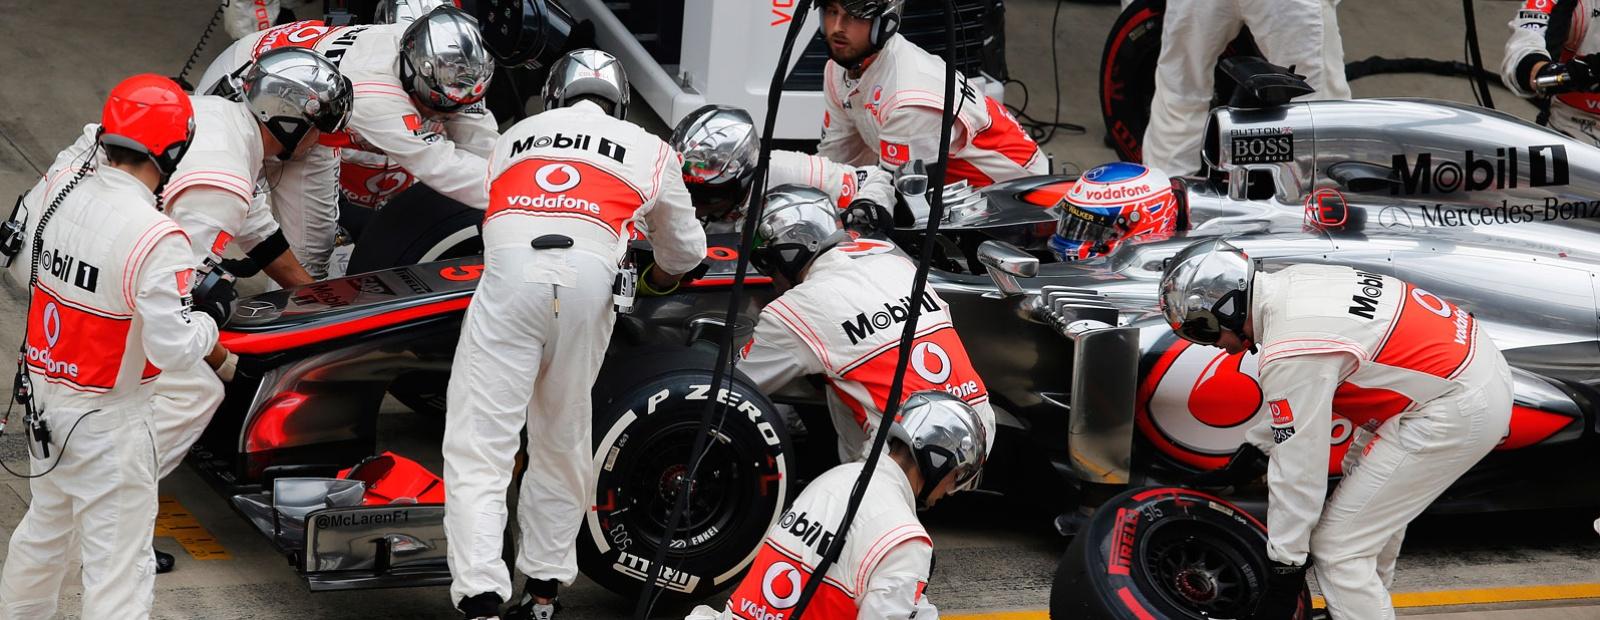 McLaren Formula 1 - Team McLaren joins McLaren.com